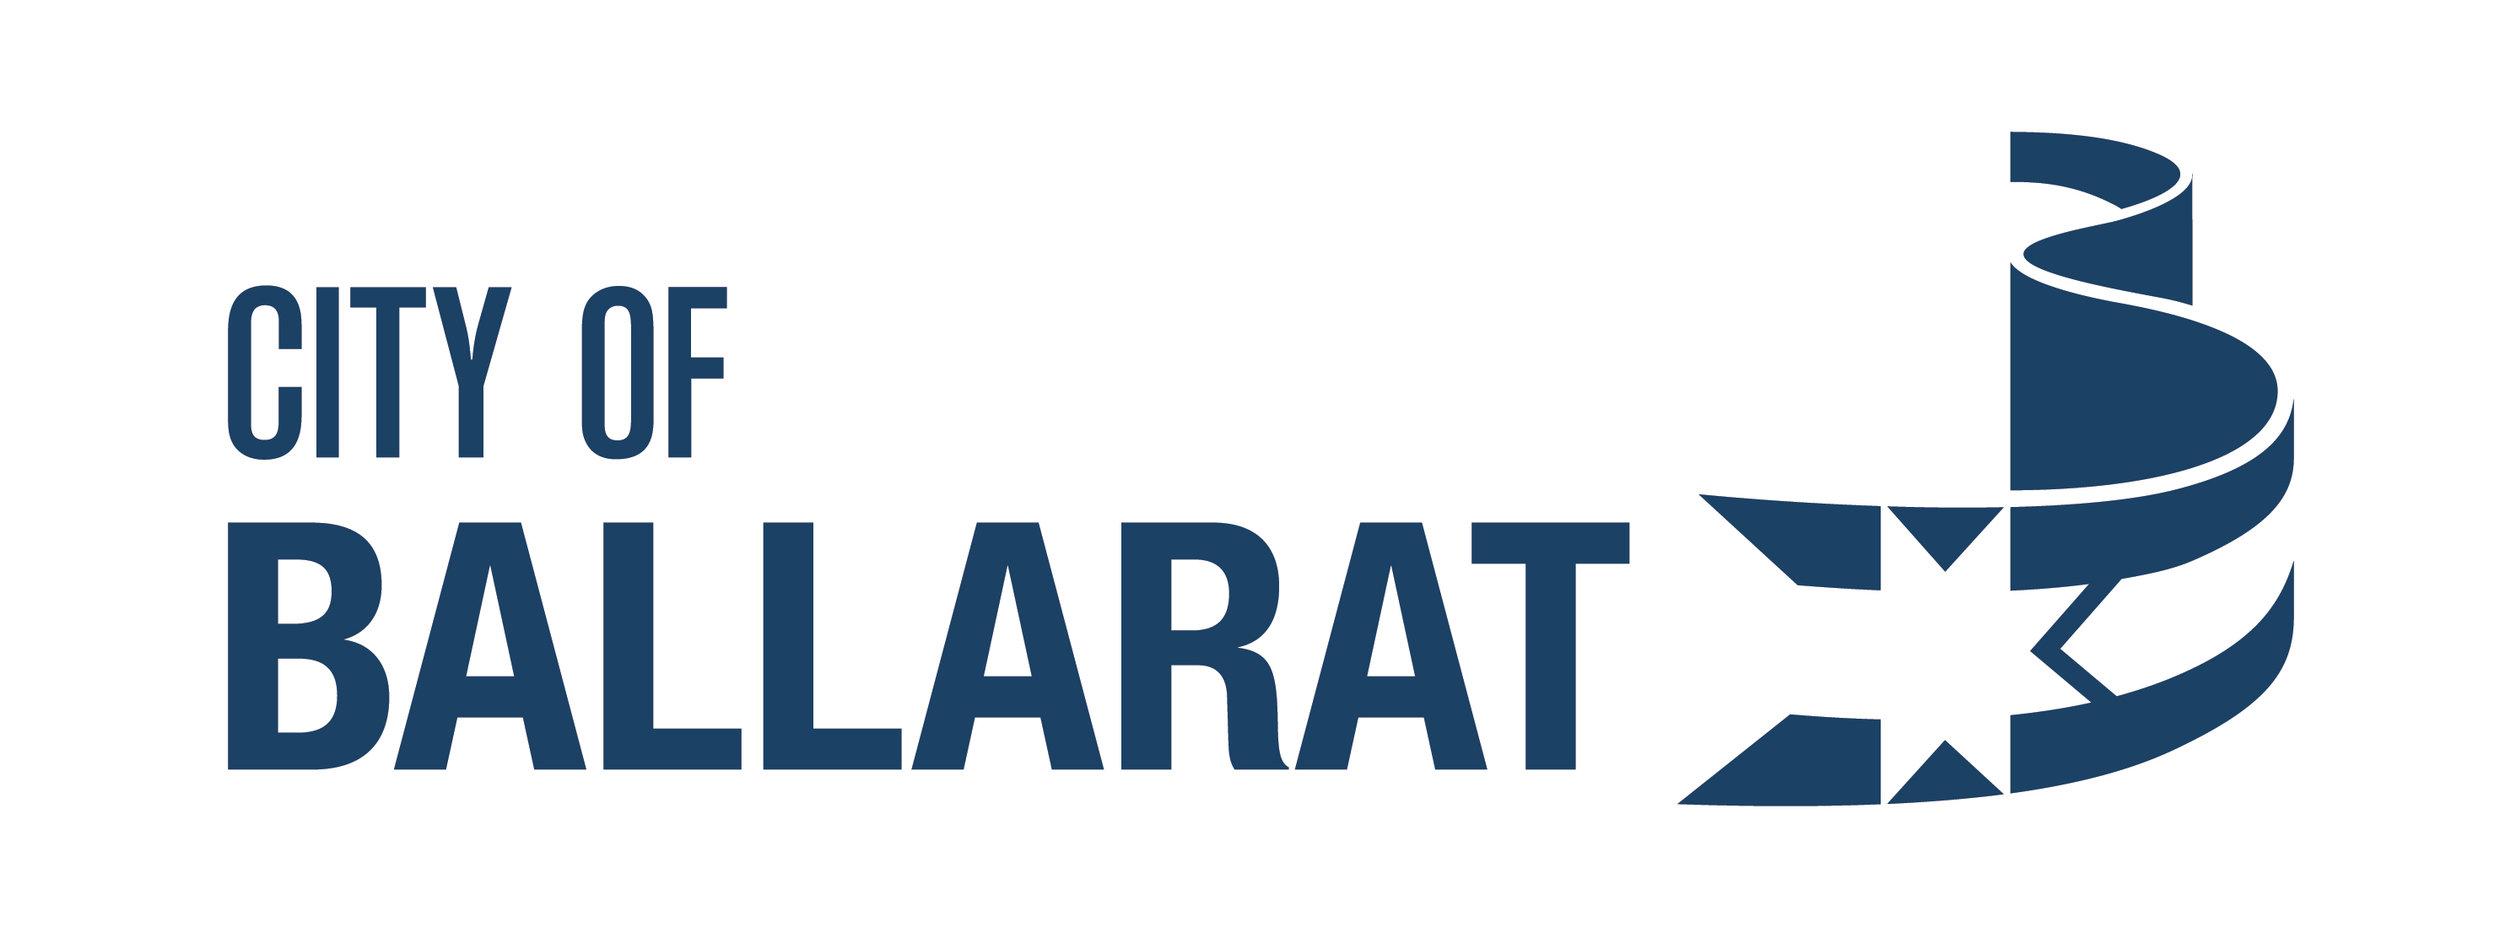 City of Ballarat Logo cmyk_2013.jpg